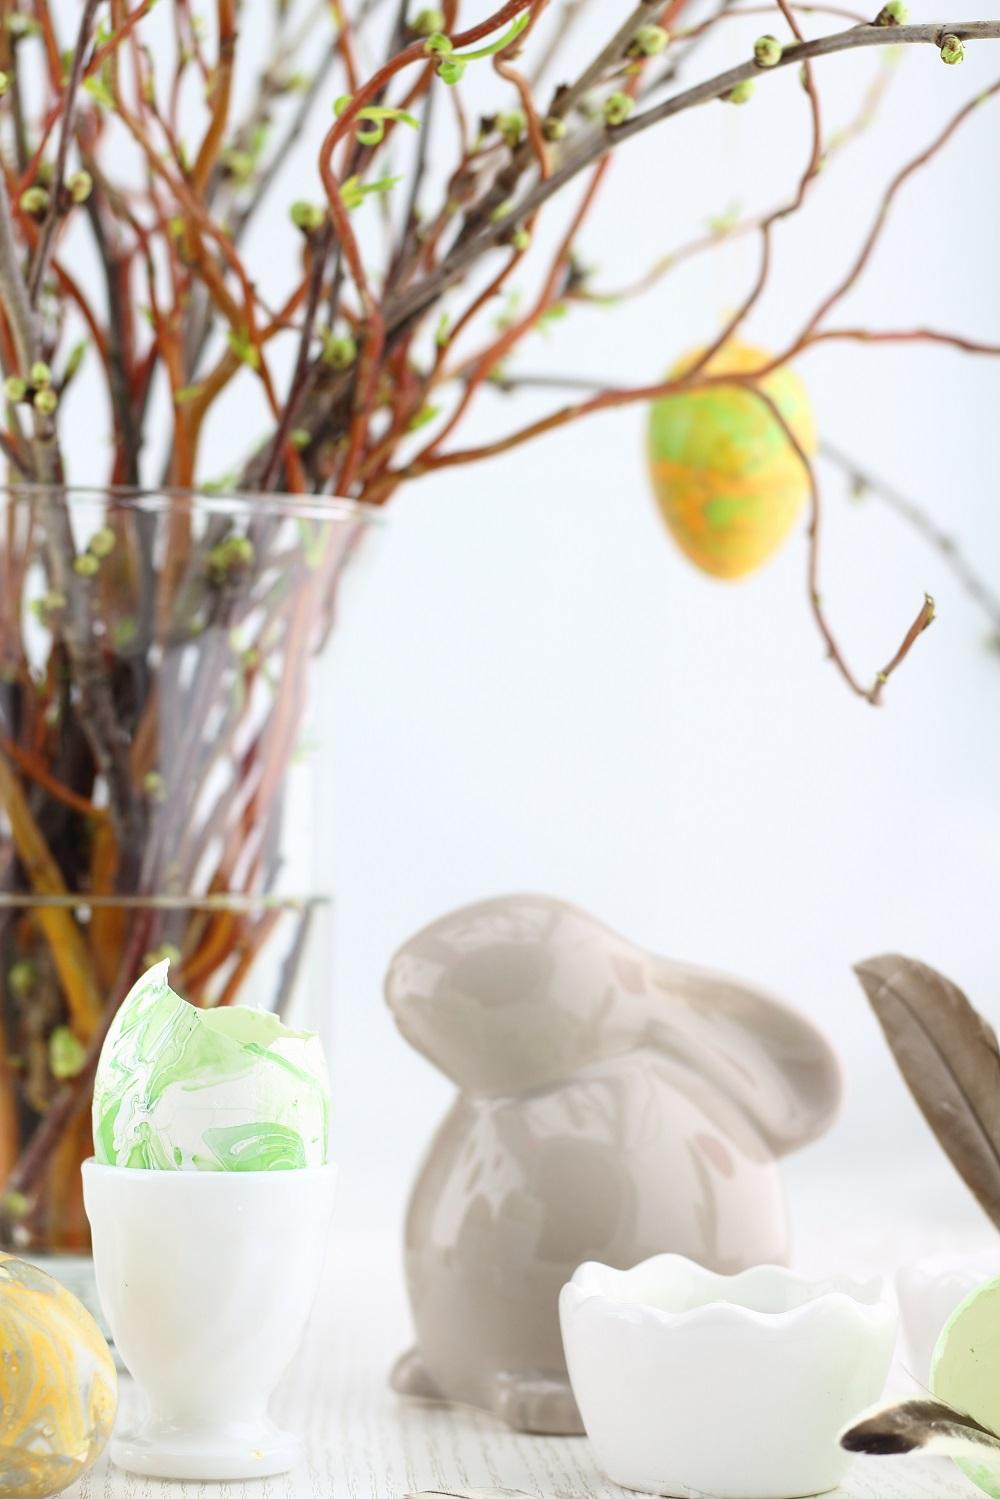 [Oster-DIY] Ostereier marmorieren mit Nagellack - watermarble easter egg - ostern - easter - diy - do it yourself - nagellack - osterdeko - frühling - karfreitag - ostersonntag